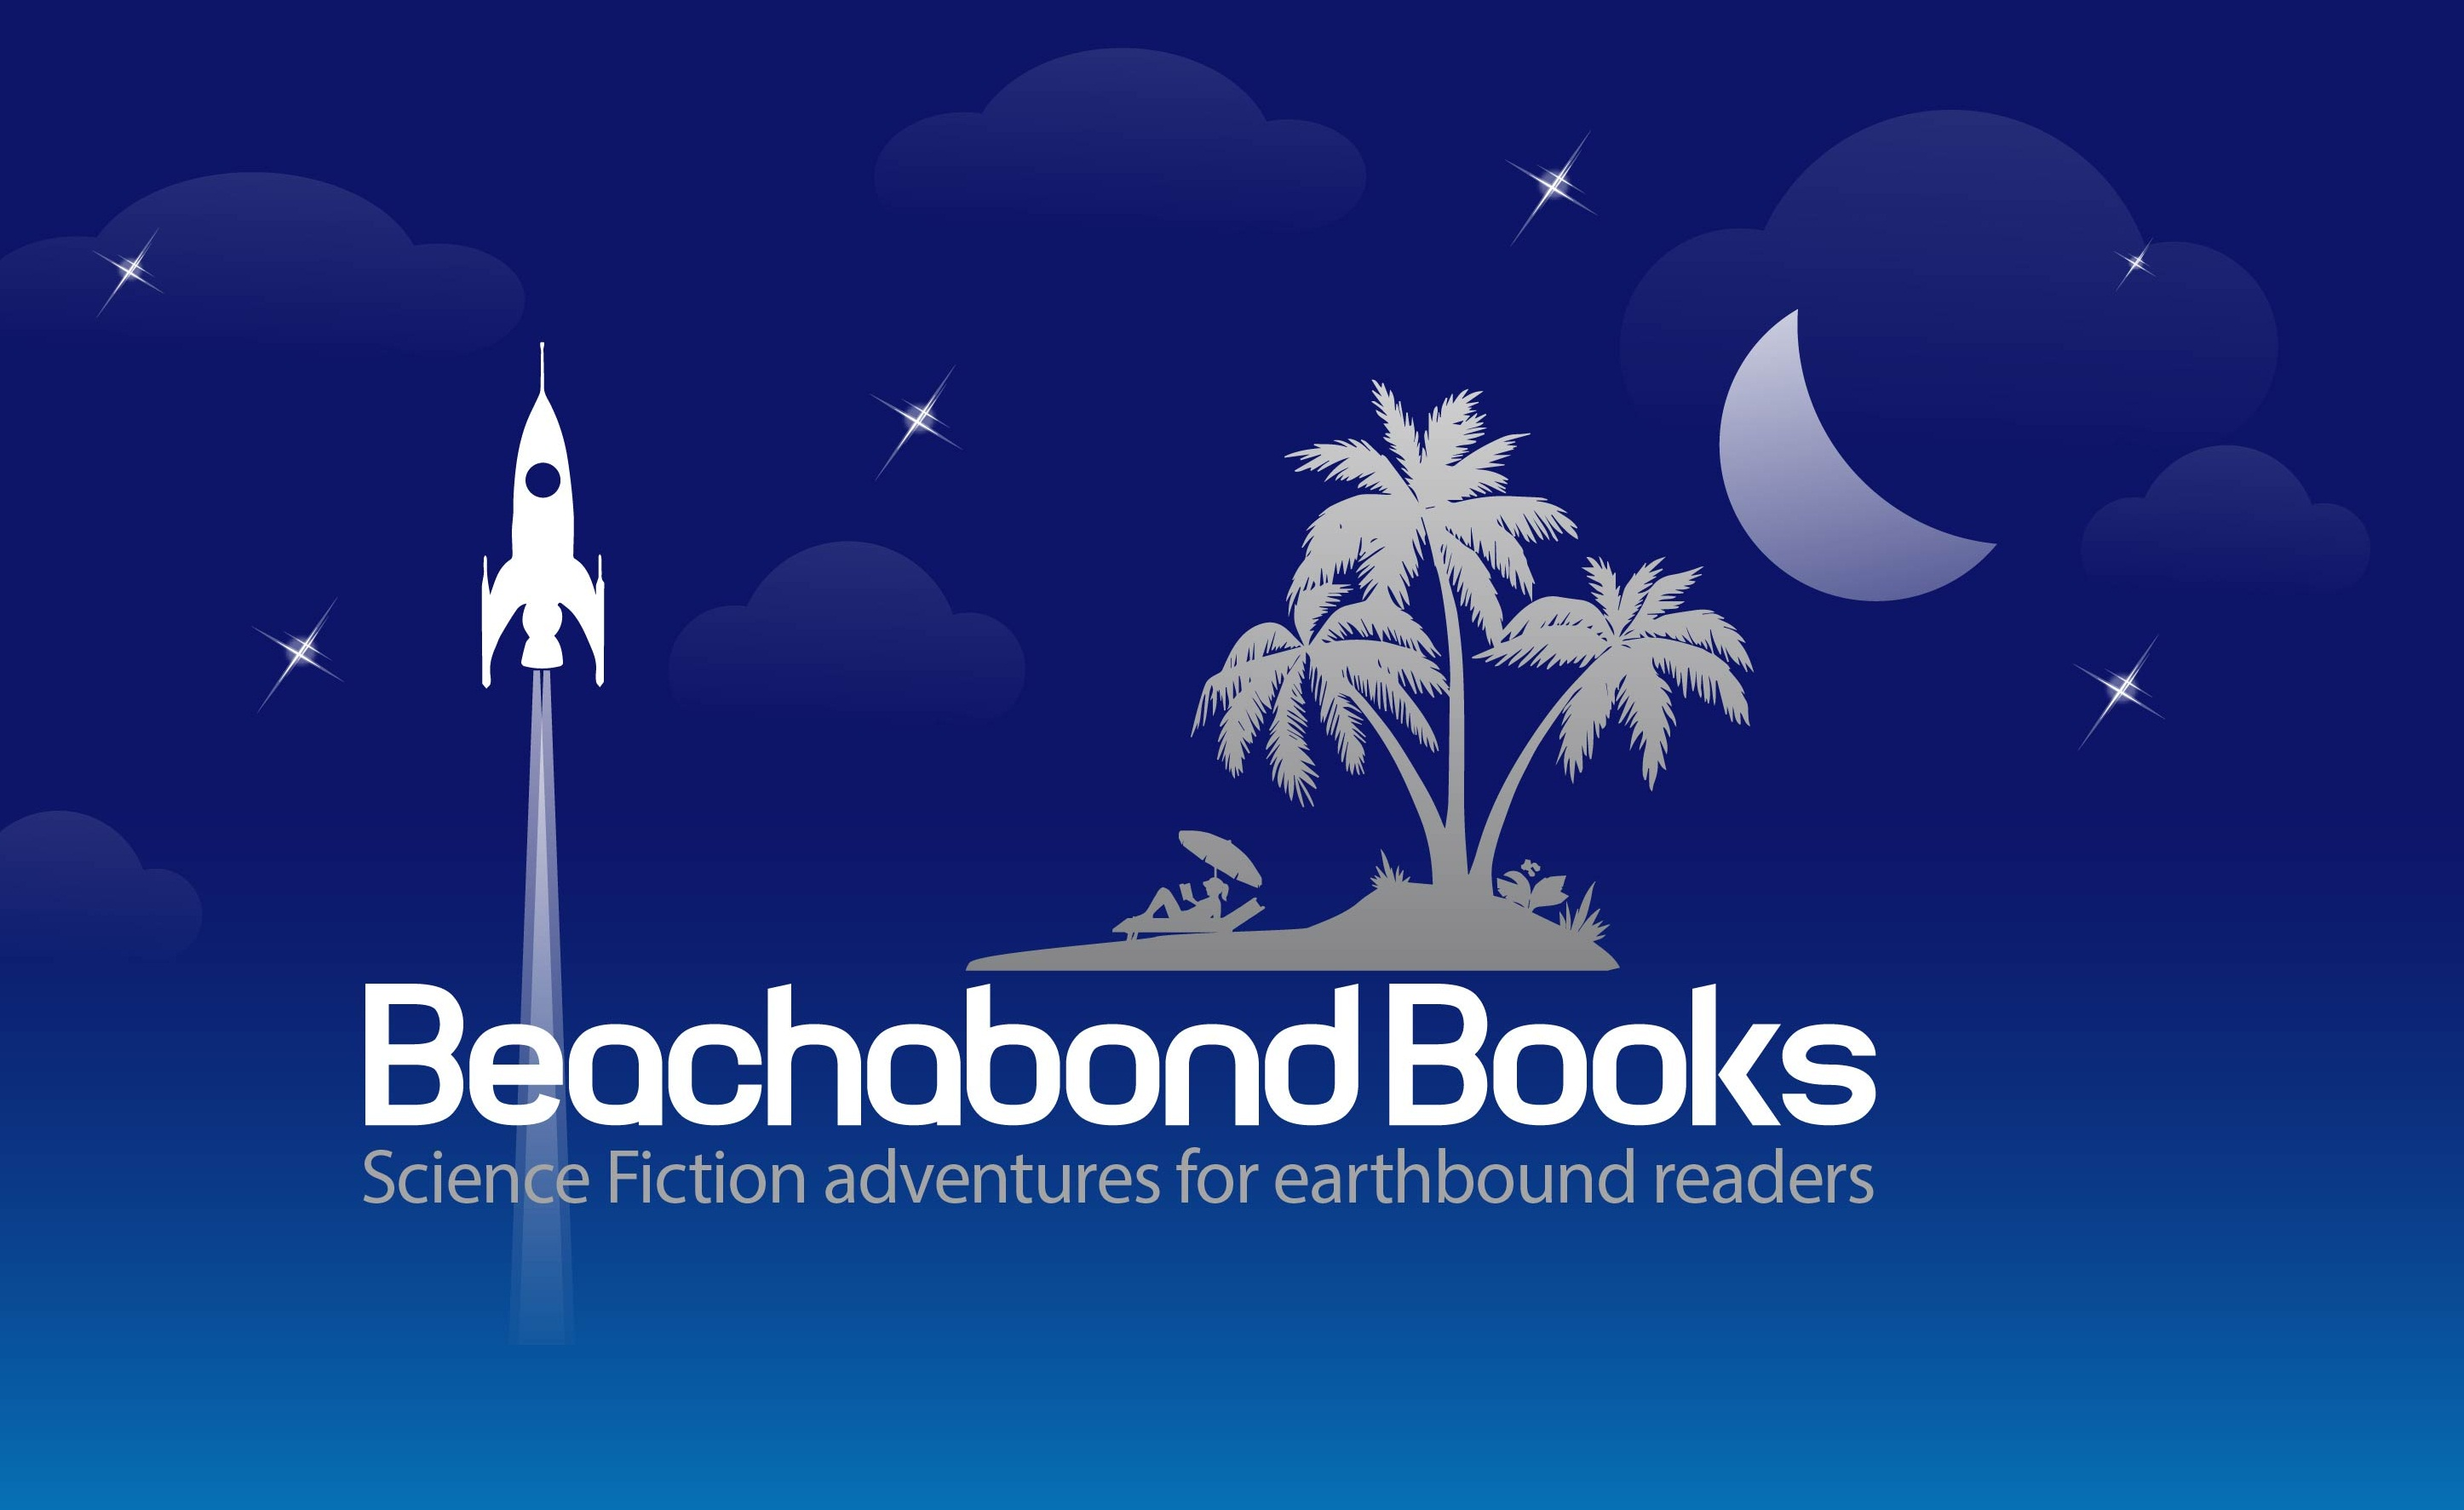 Beachabond-Books_